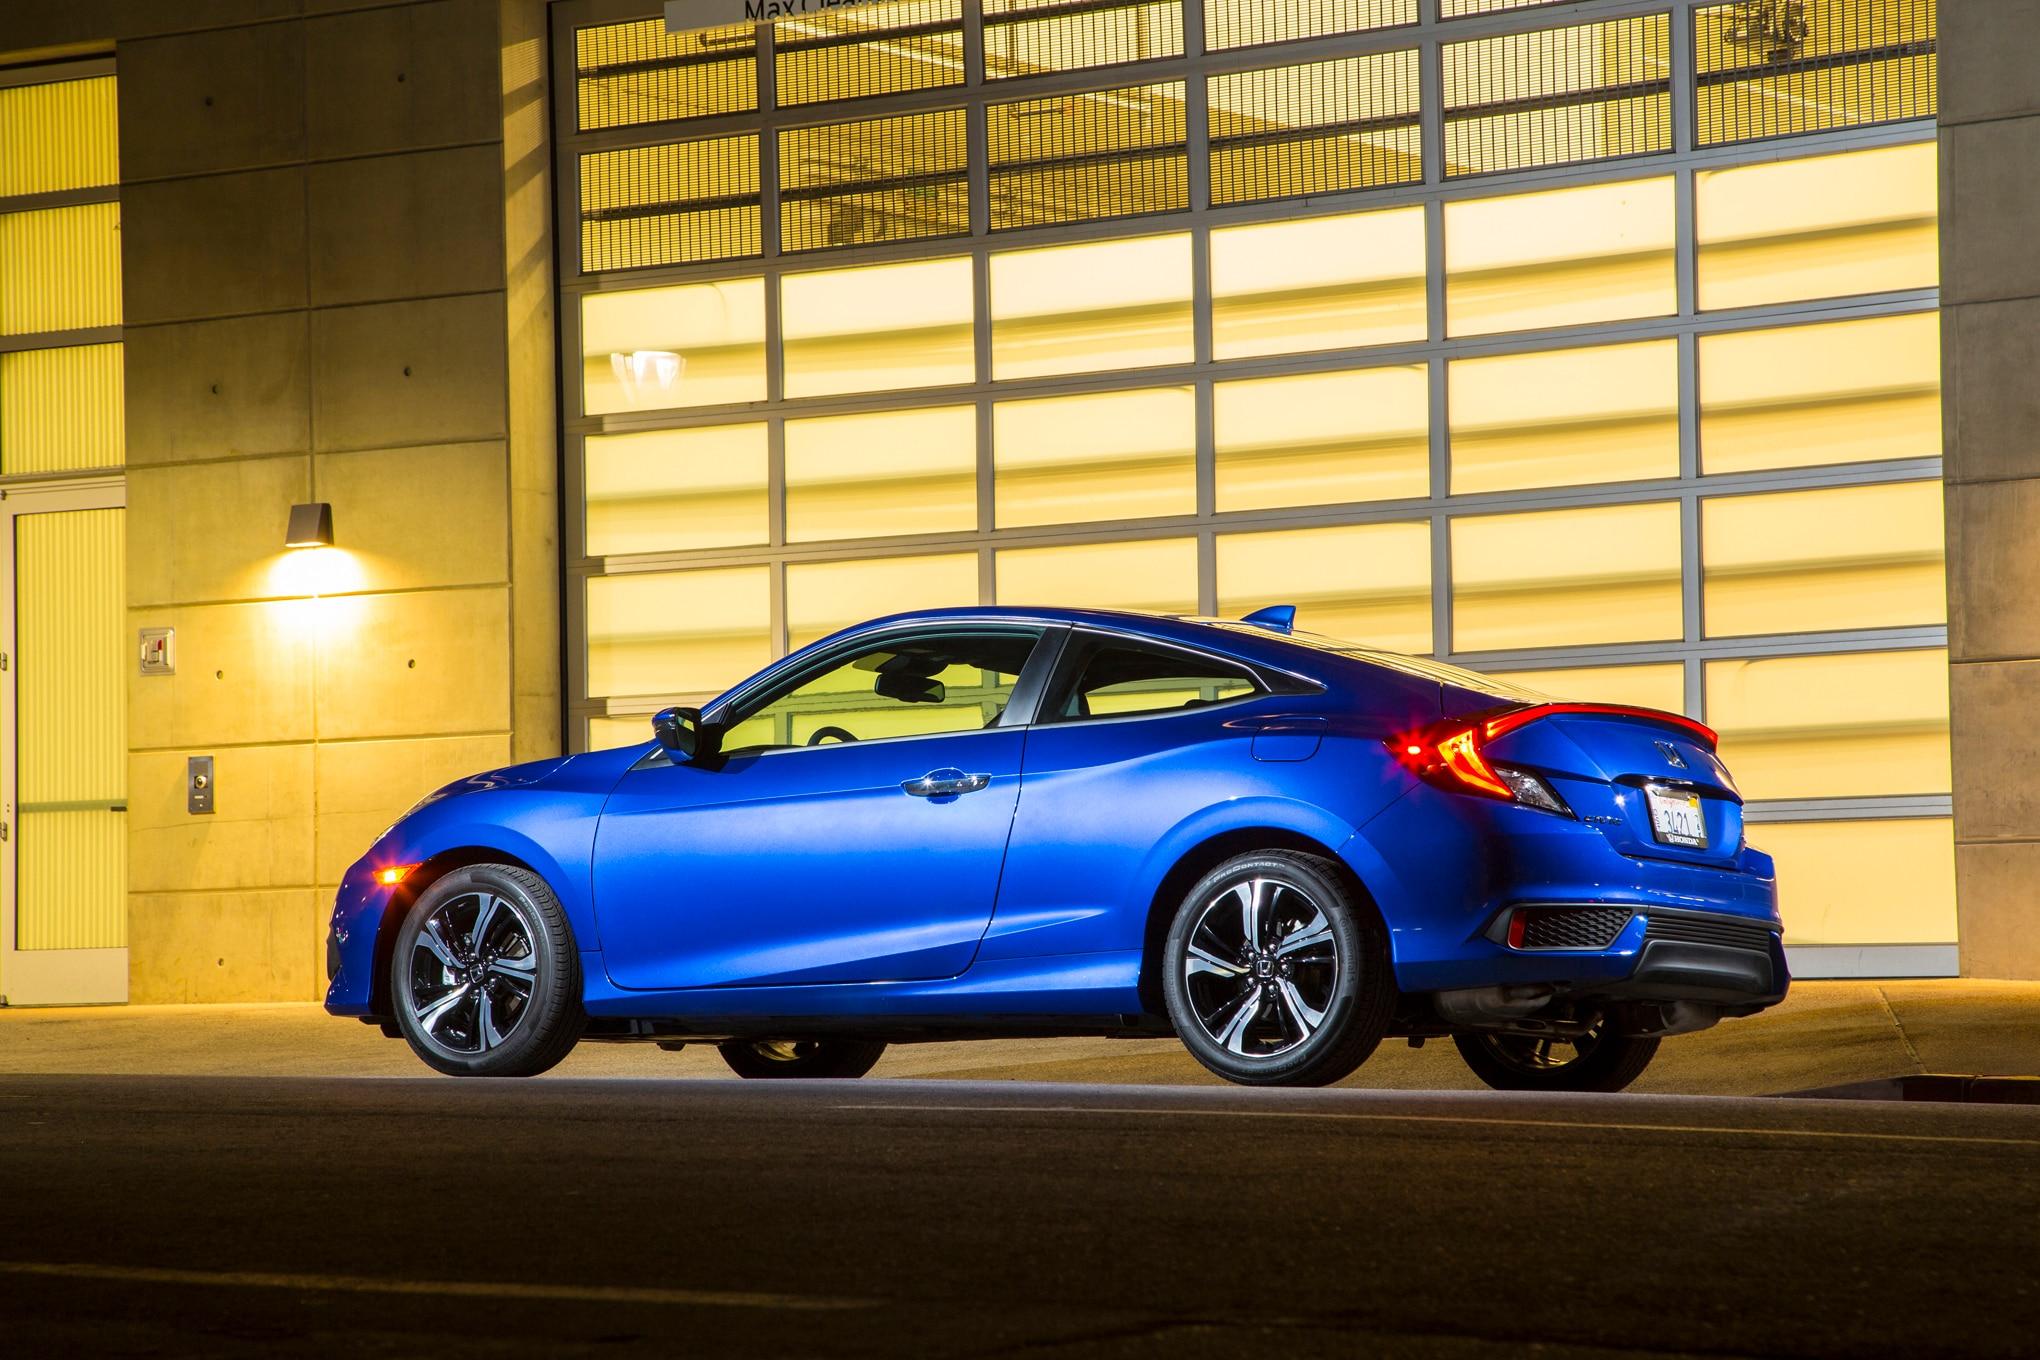 Honda Civic Coupe: 2016 Honda Civic Coupe Touring One Week Review